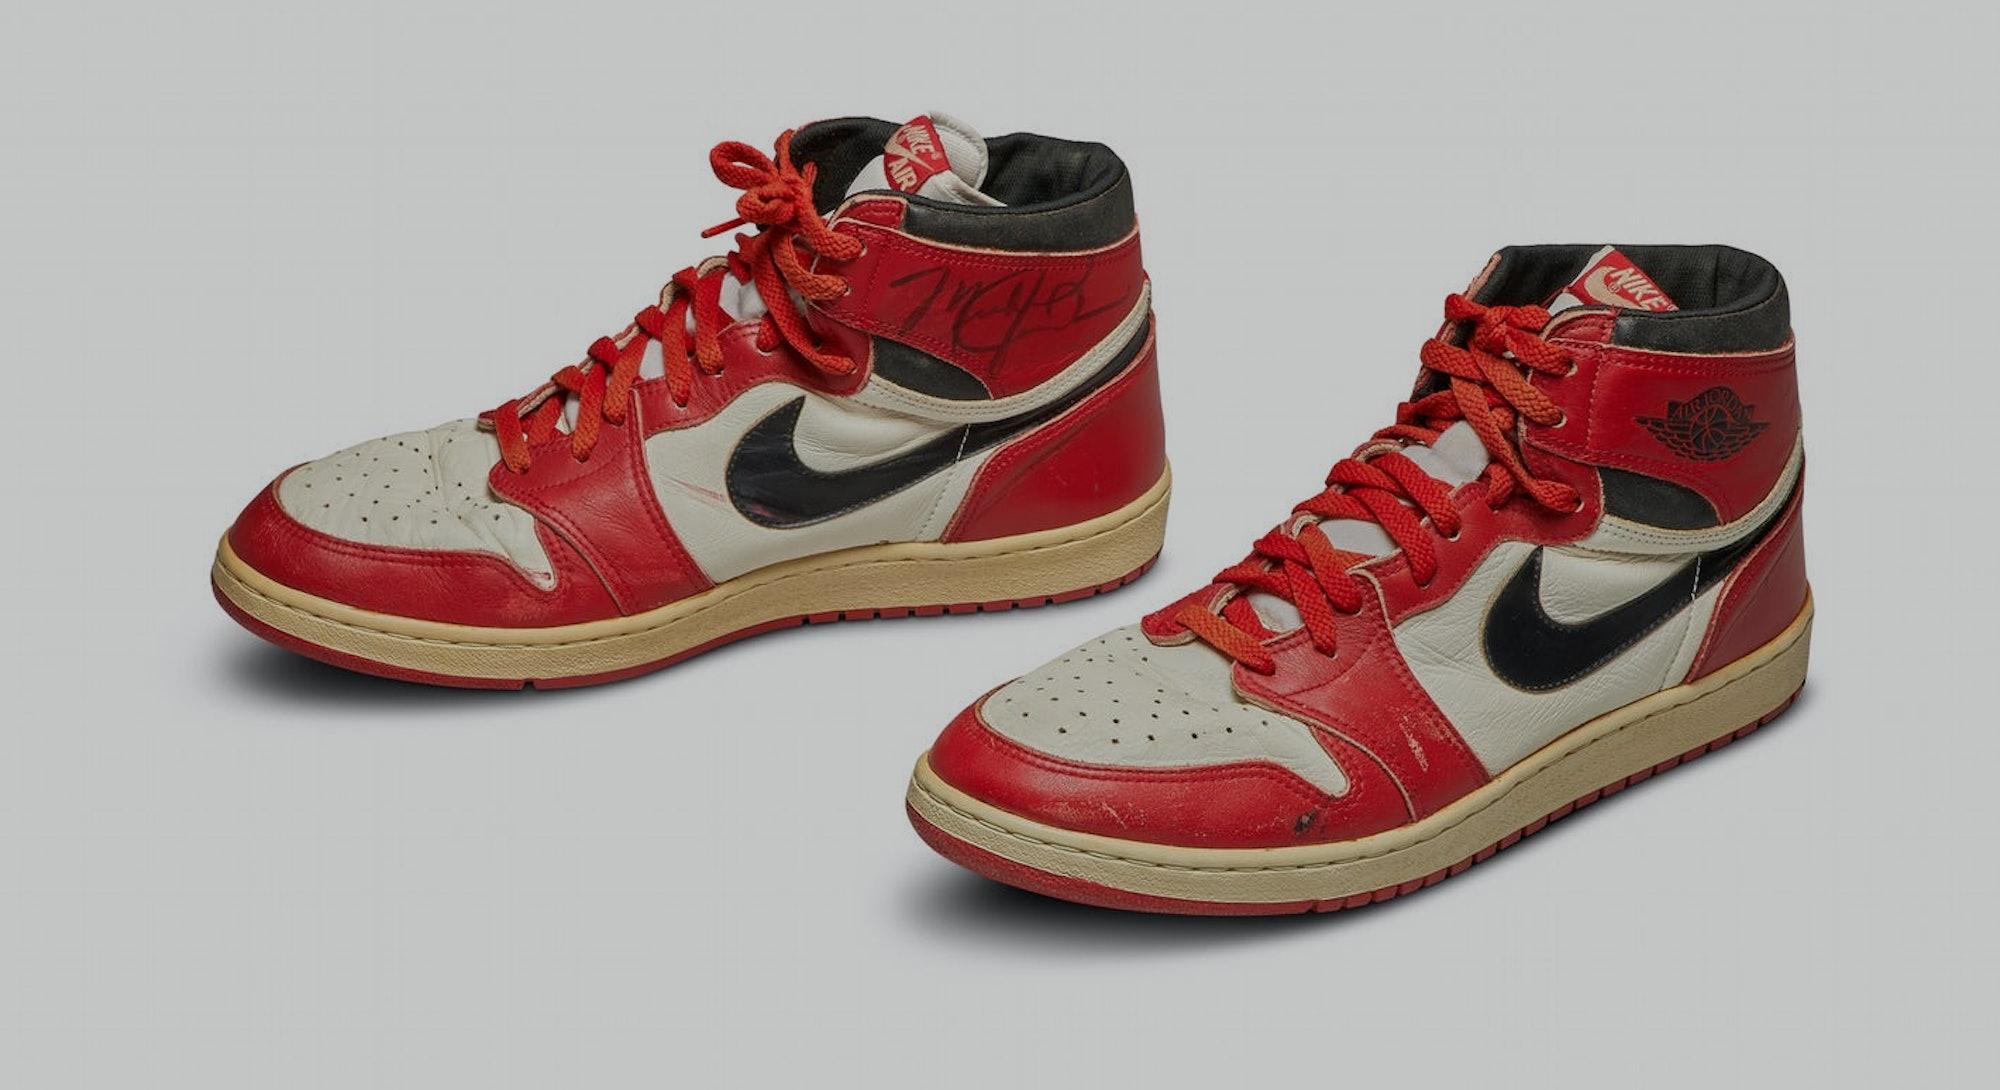 MJ Air Jordan 1's.